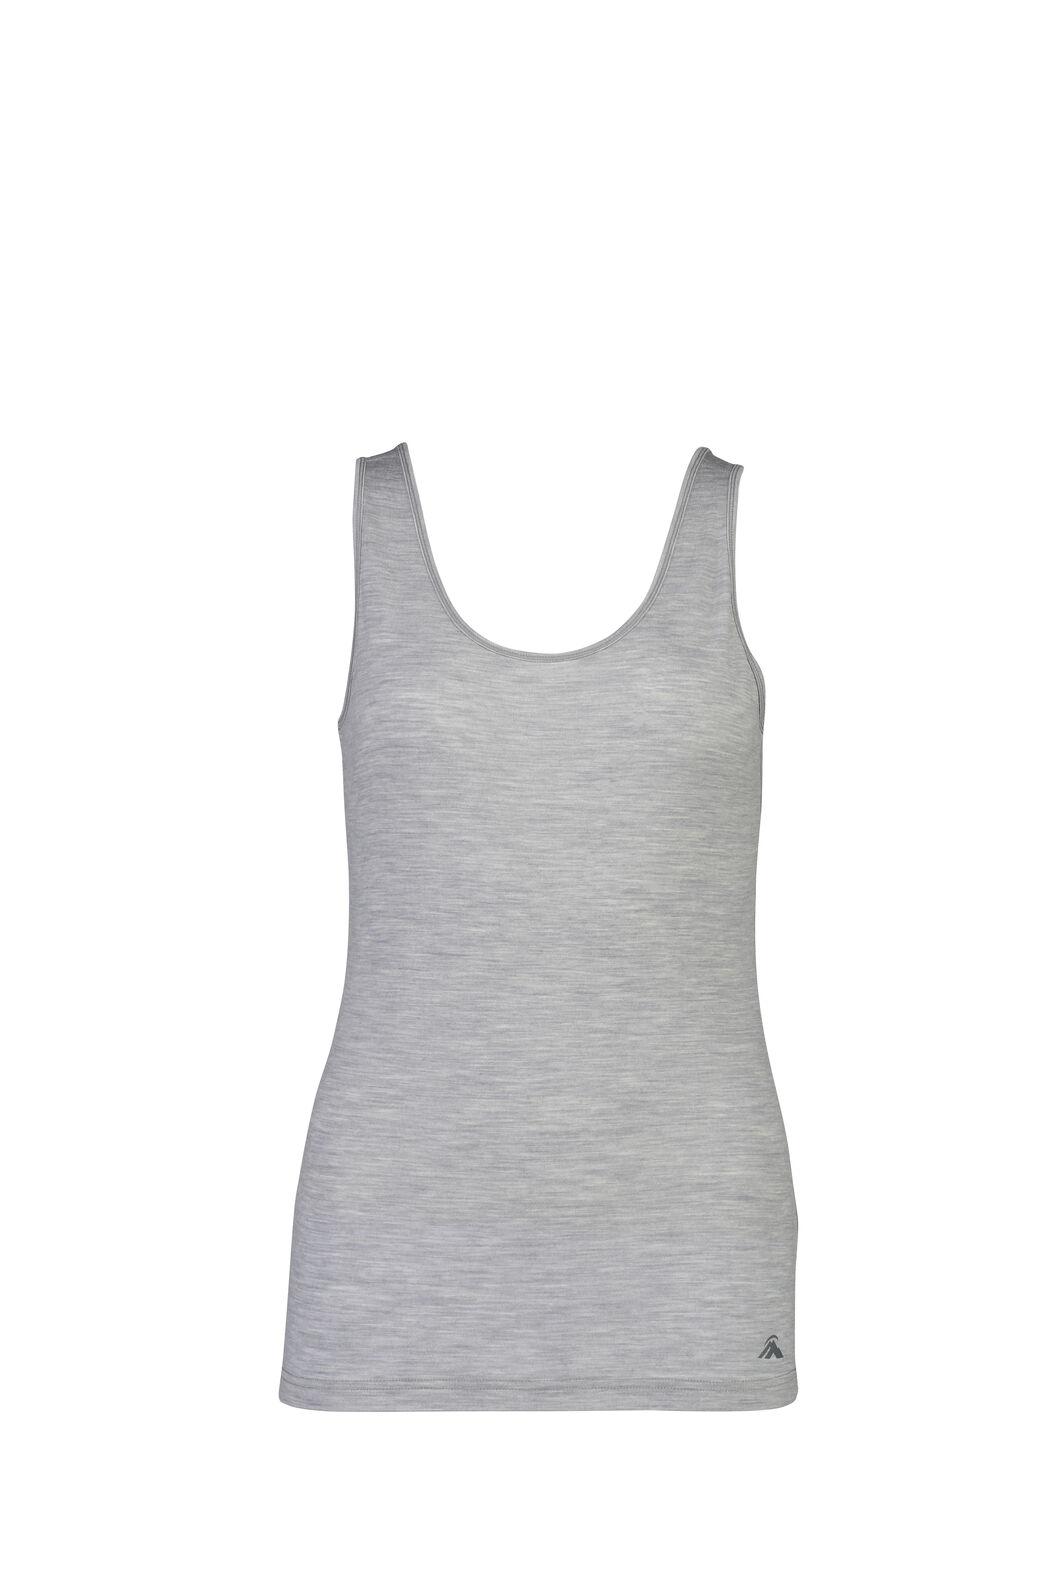 Macpac 150 Merino Singlet — Women's, Light Grey Marle, hi-res